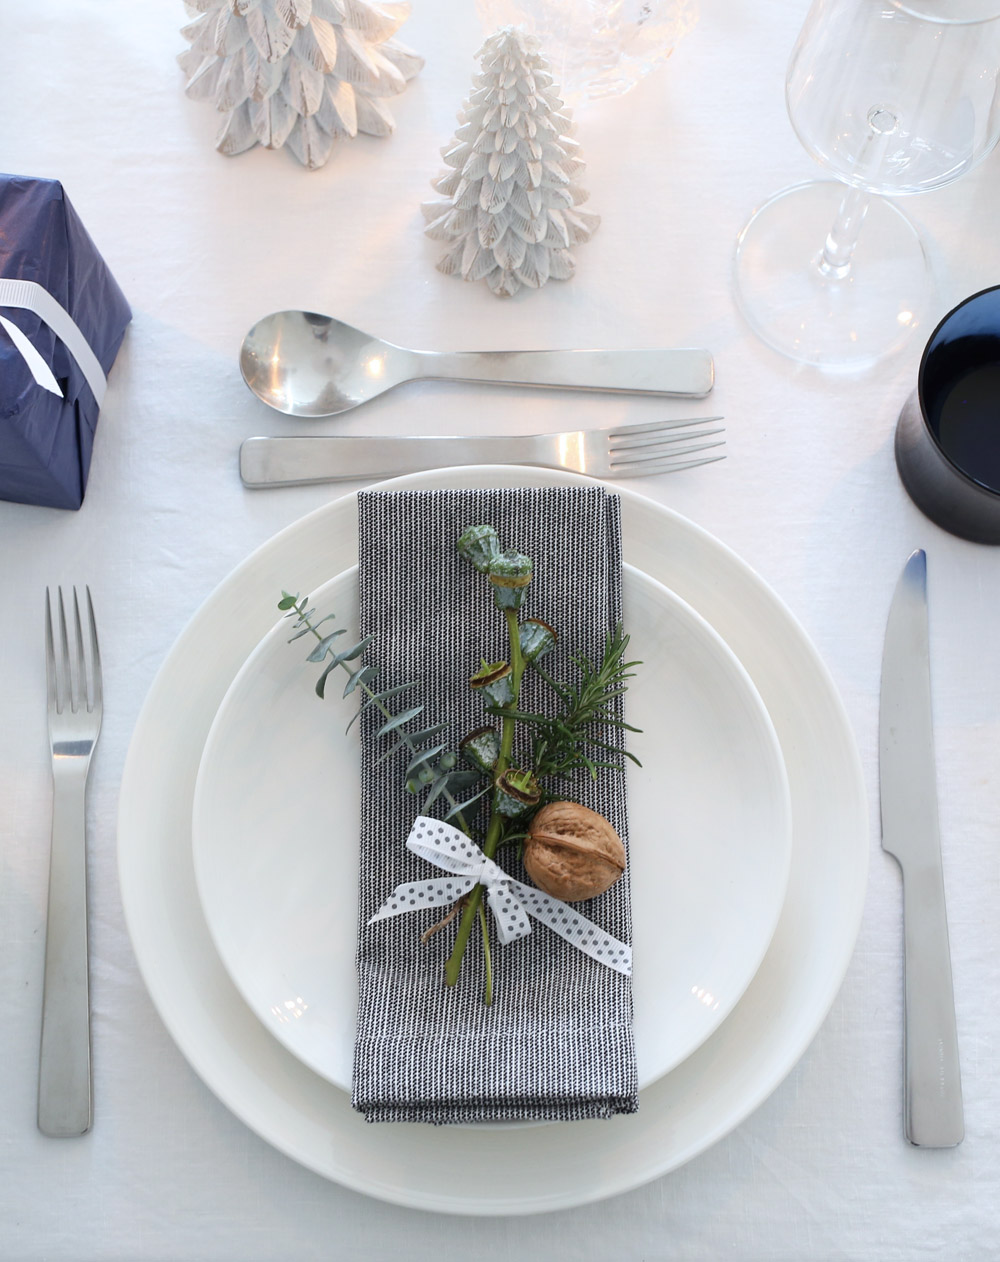 Blue & white festive table setting